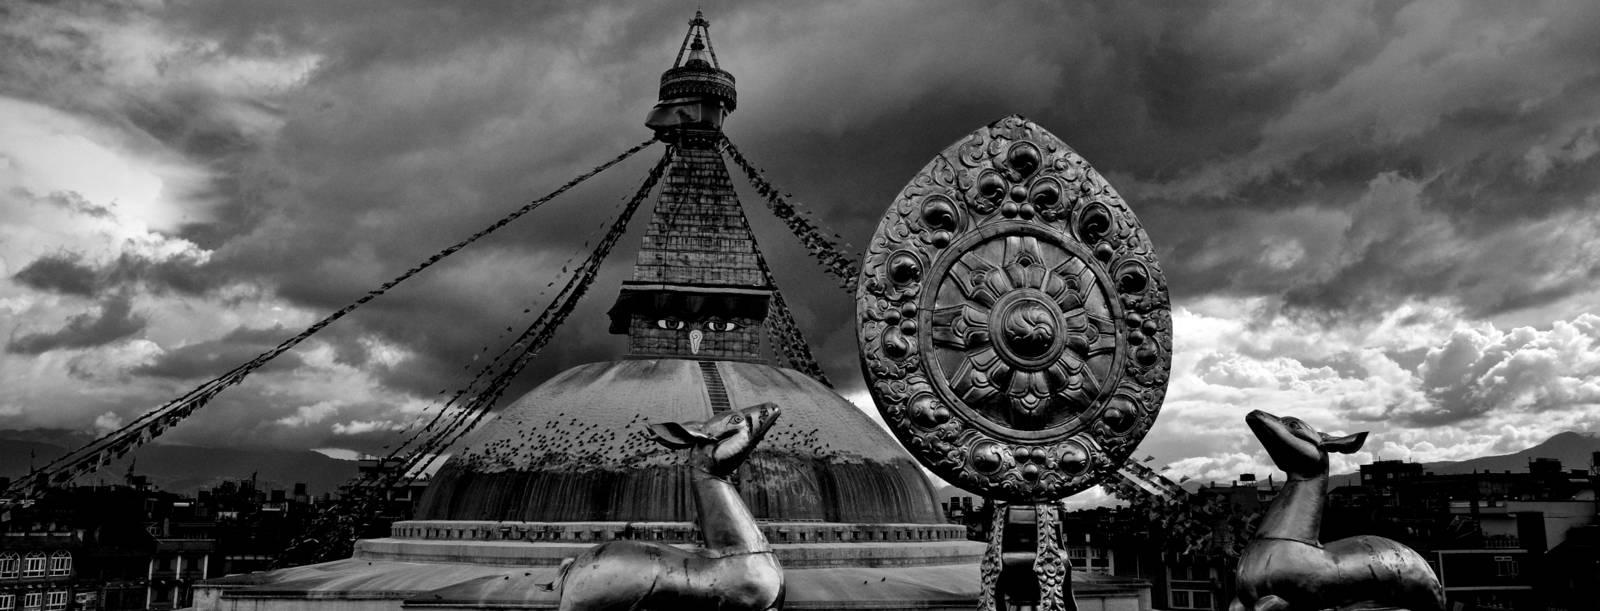 The chorten at Bodhnath, Kathmandu valley